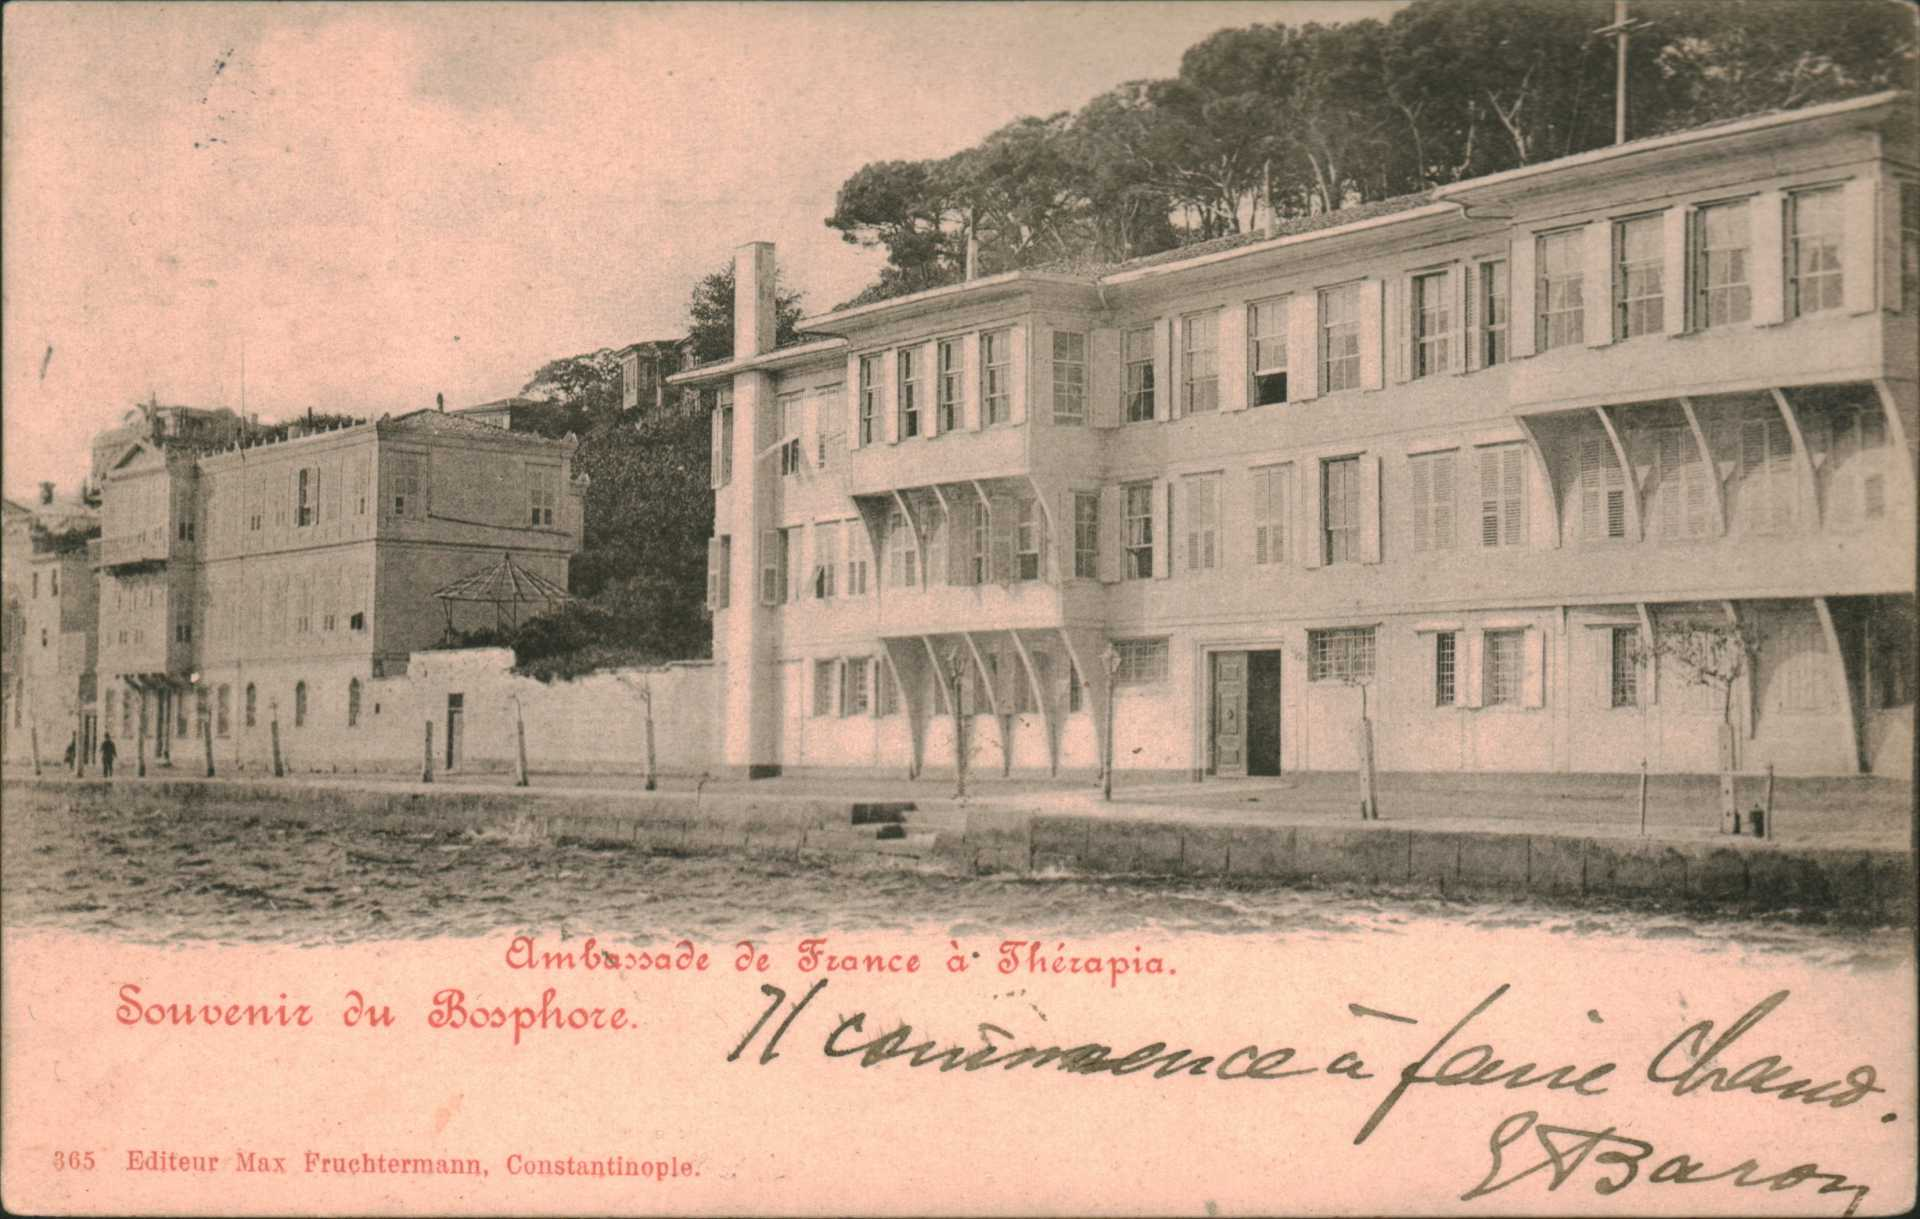 Ambassade de France a Therapia – Souvenir du Bosphore